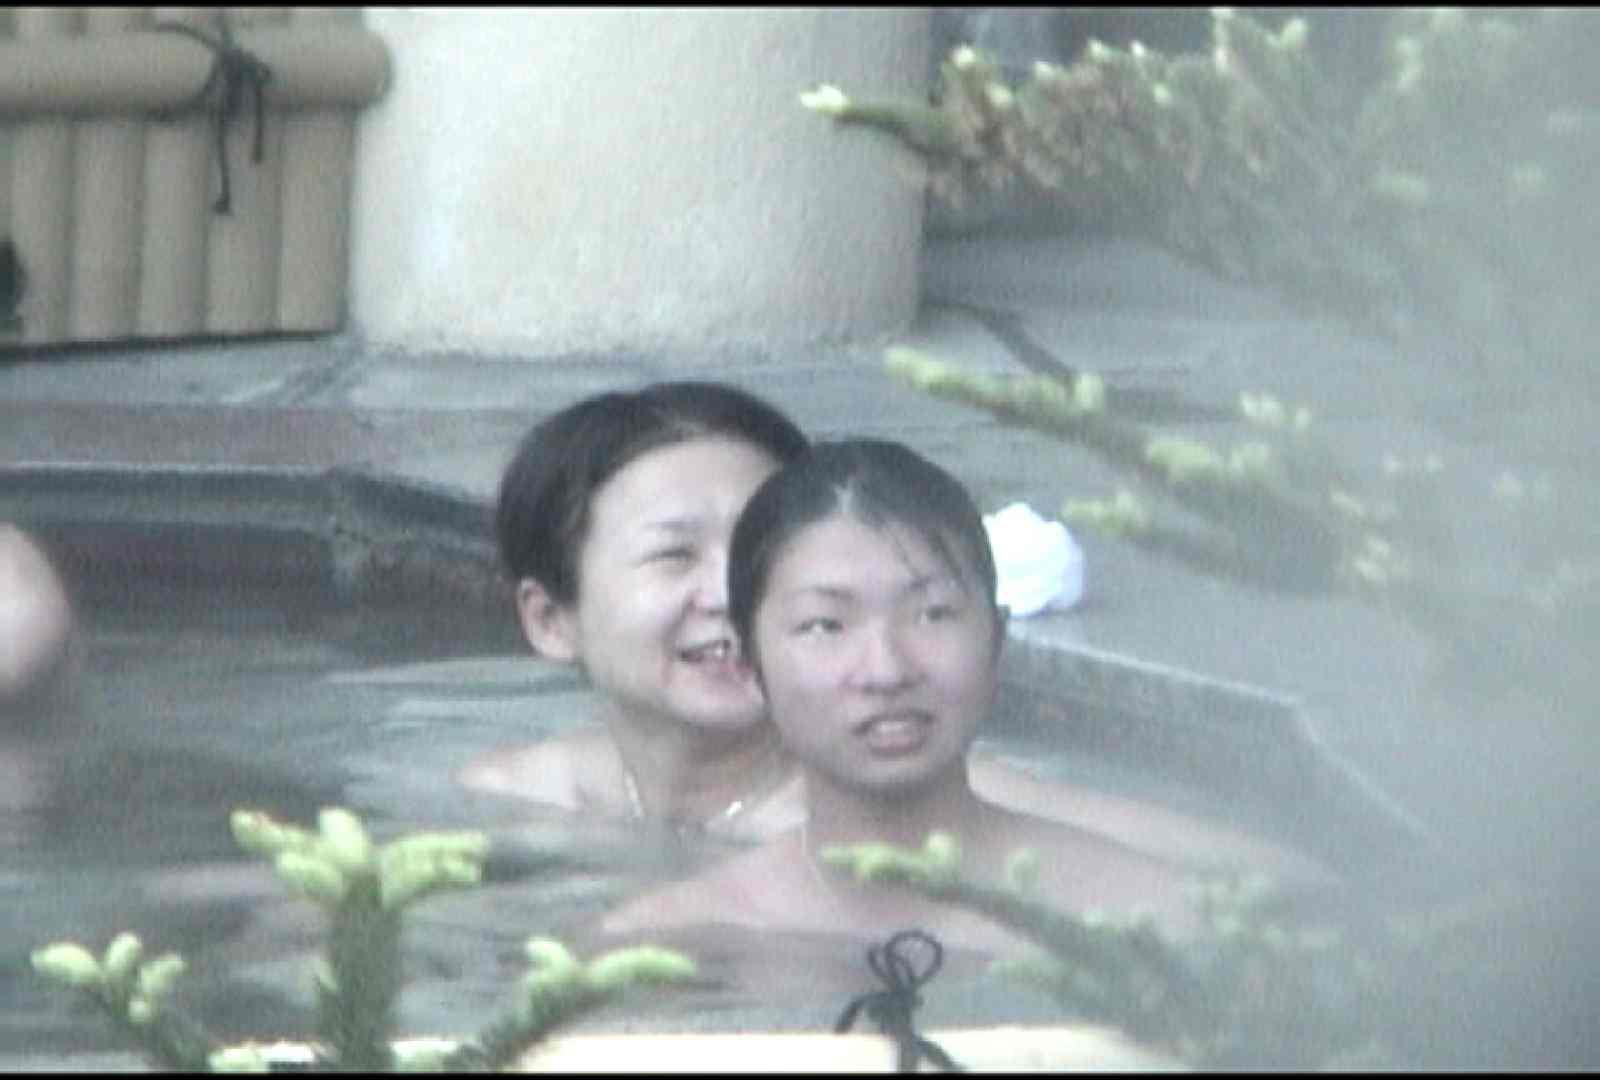 Aquaな露天風呂Vol.15 盗撮映像  42Pix 28